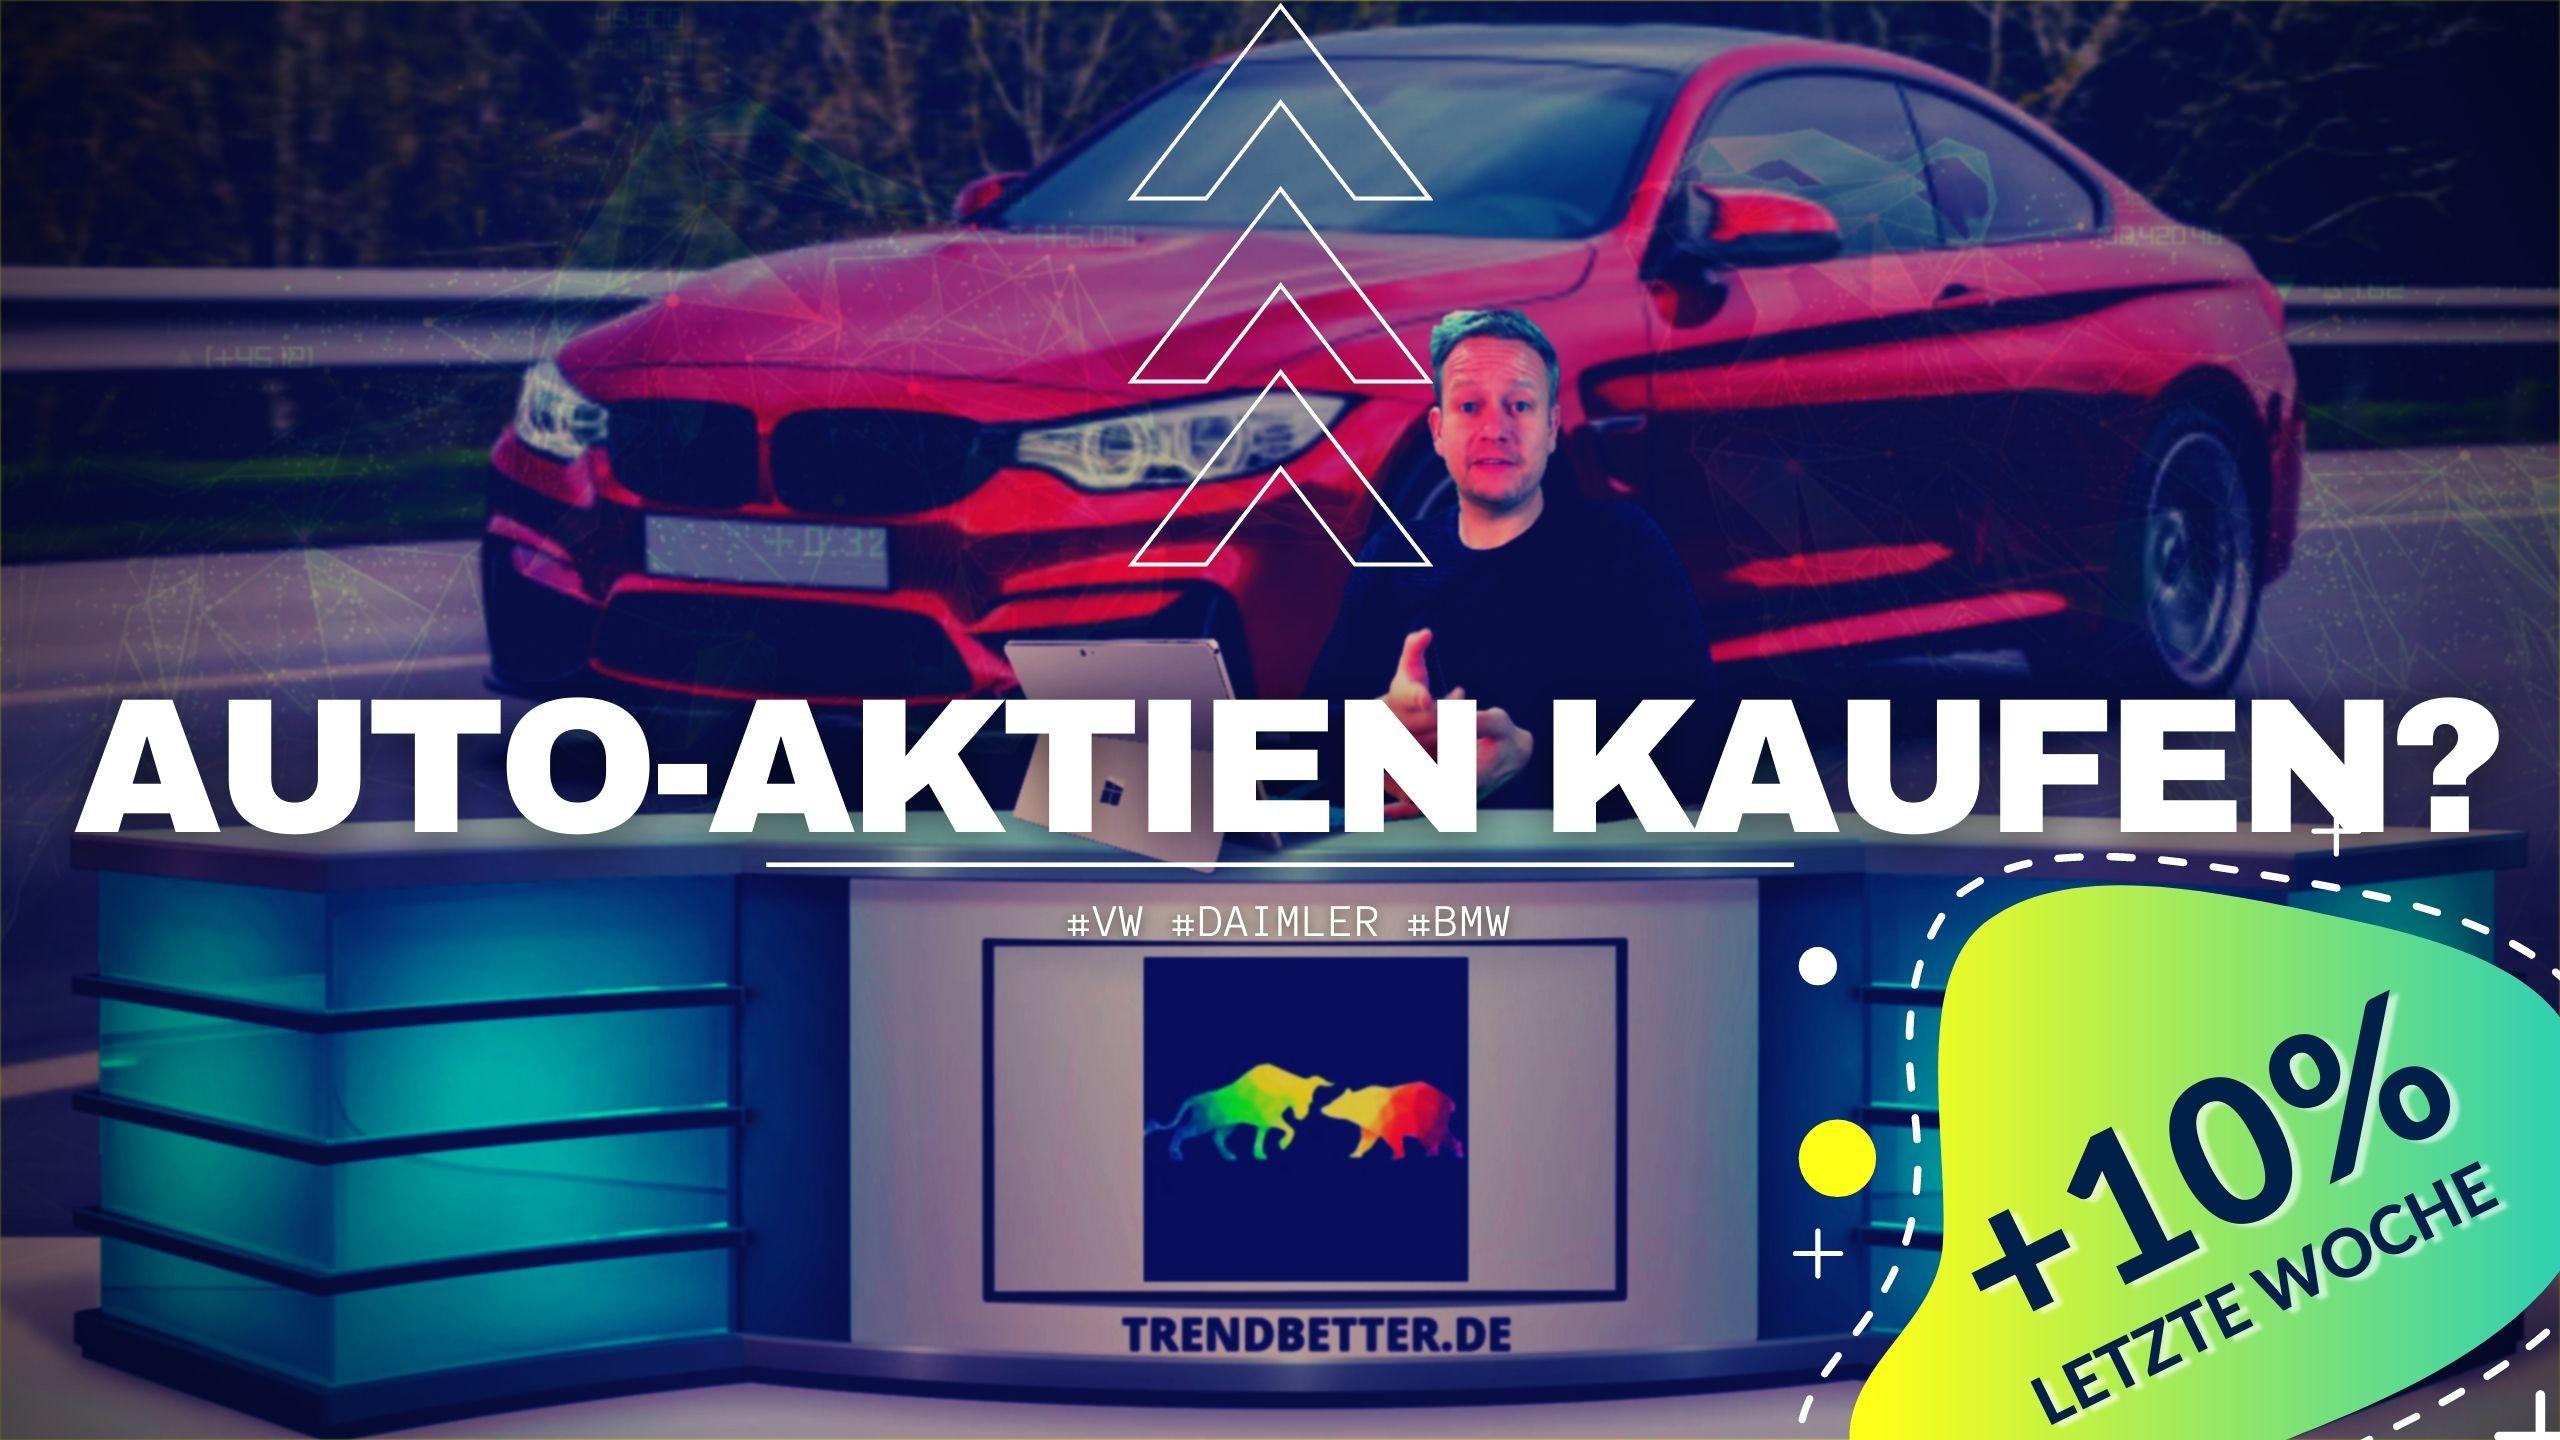 Auto-Aktien kaufen 2021 - Vw, Daimler, BMW